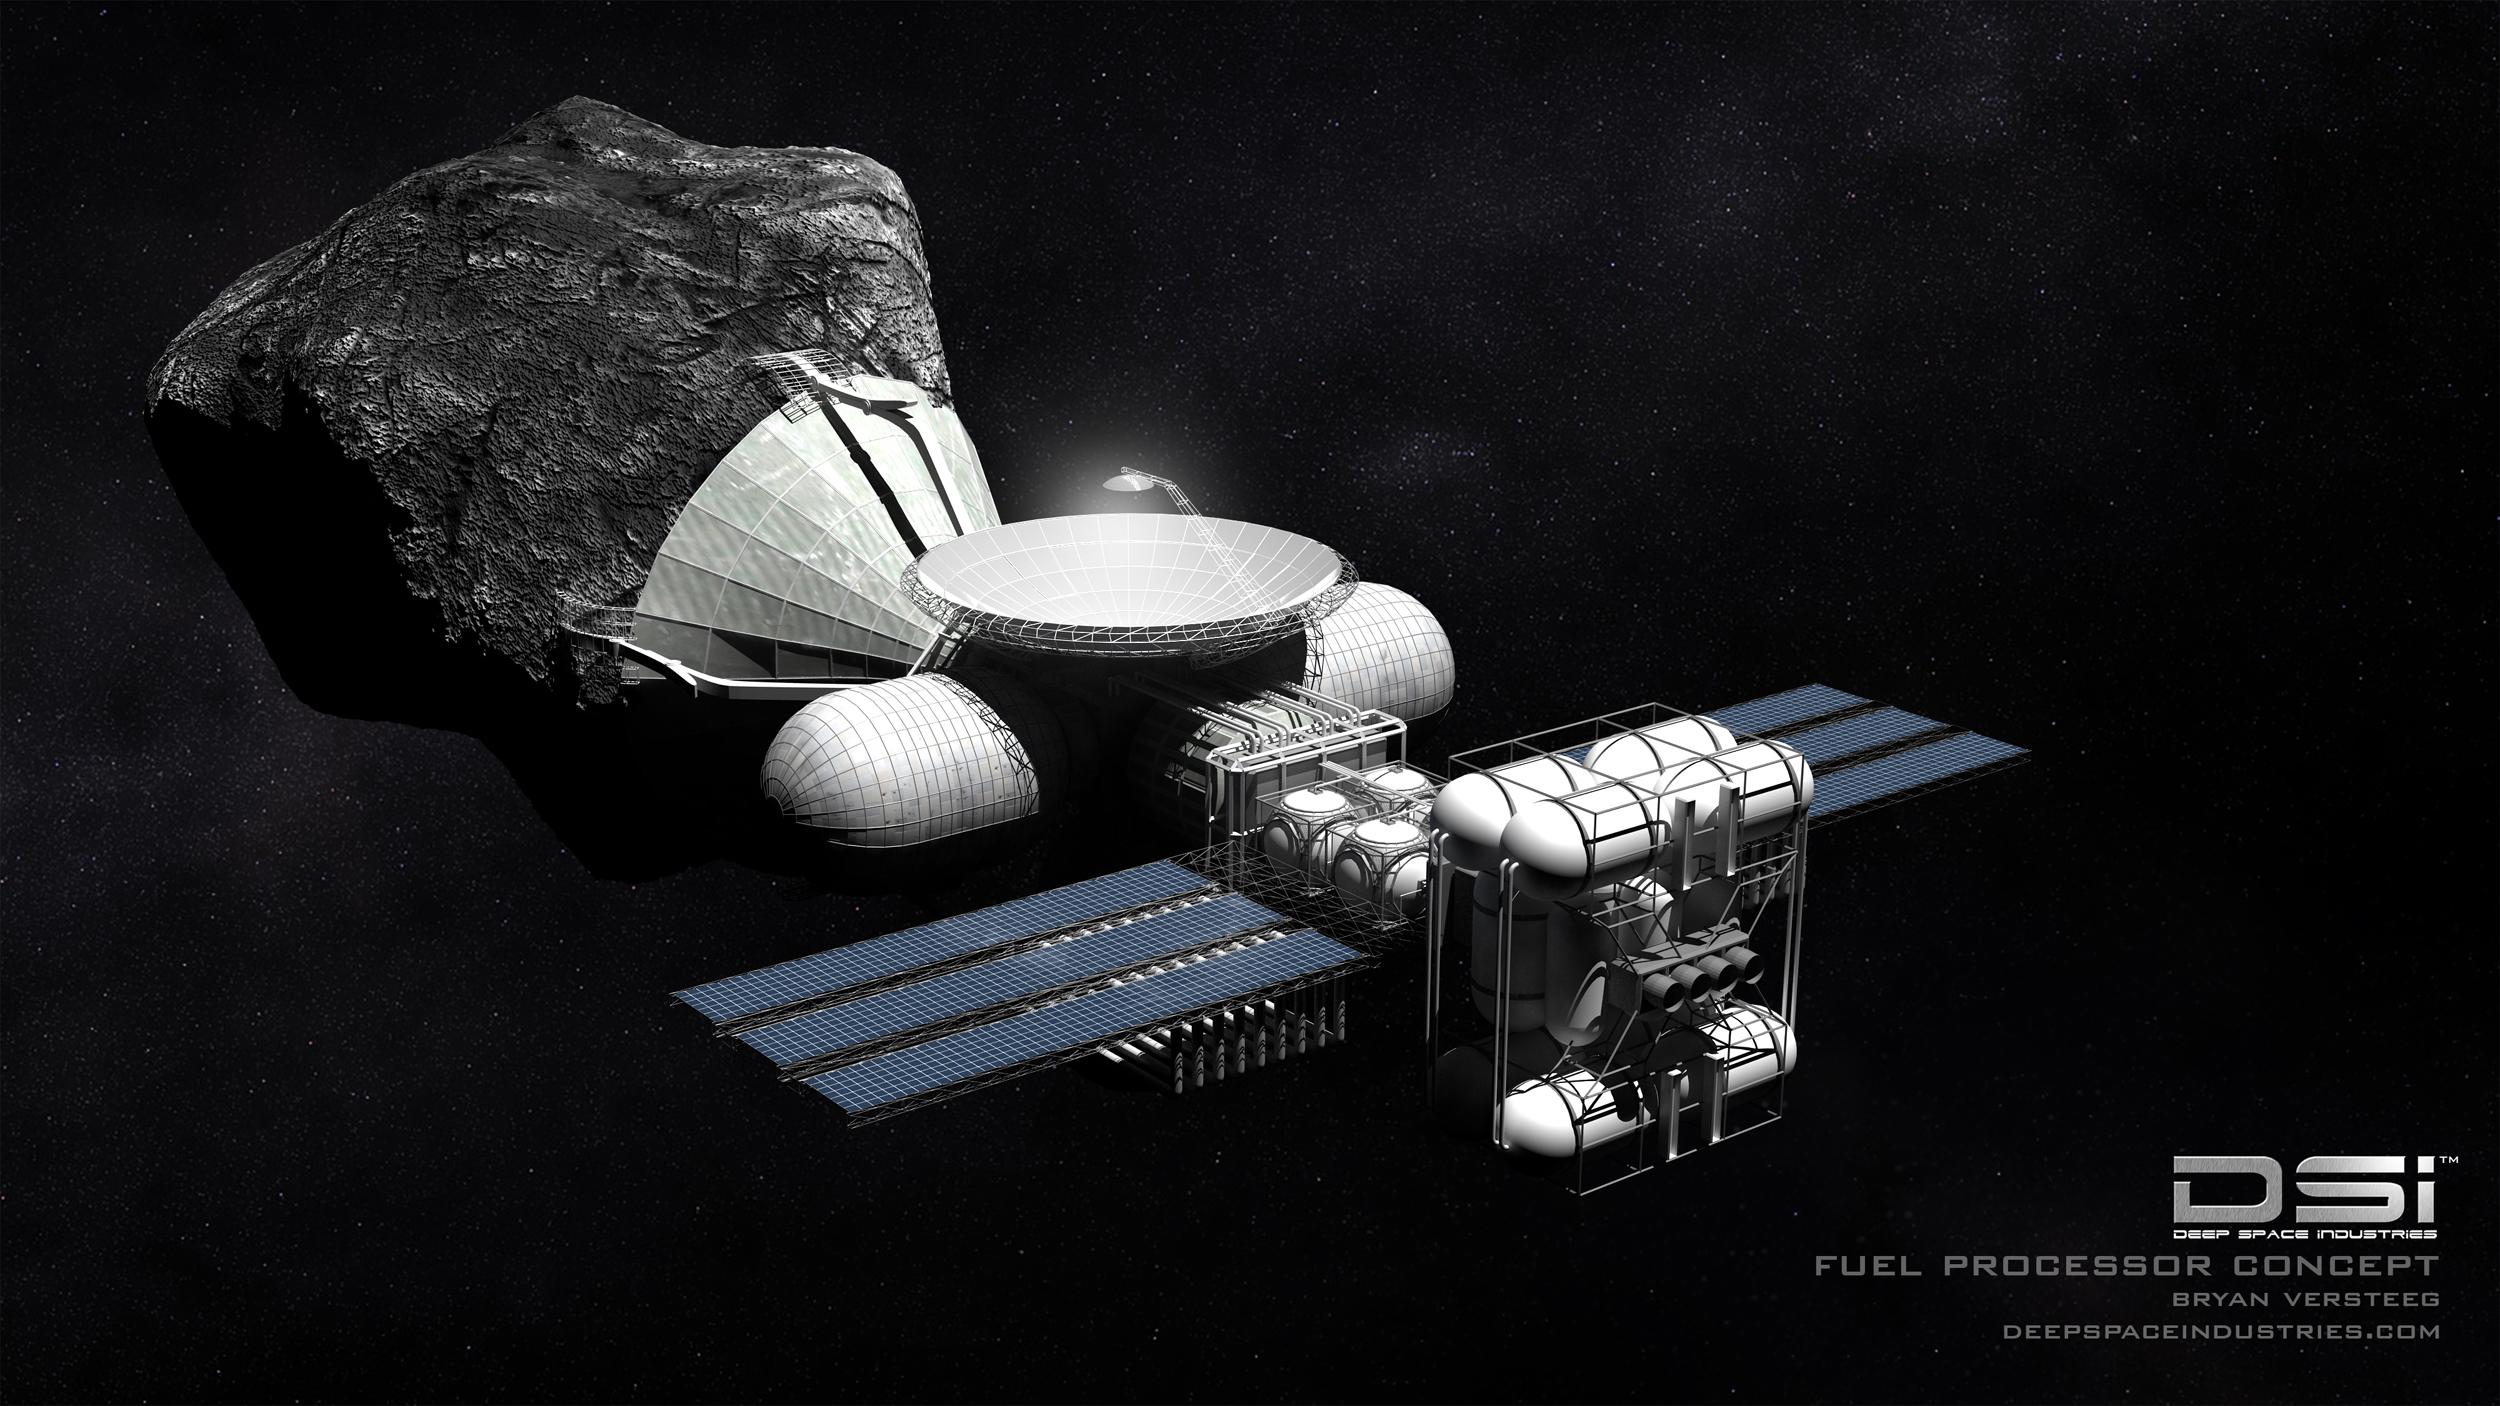 Deep Space Industries Fuel Processor Spacecraft